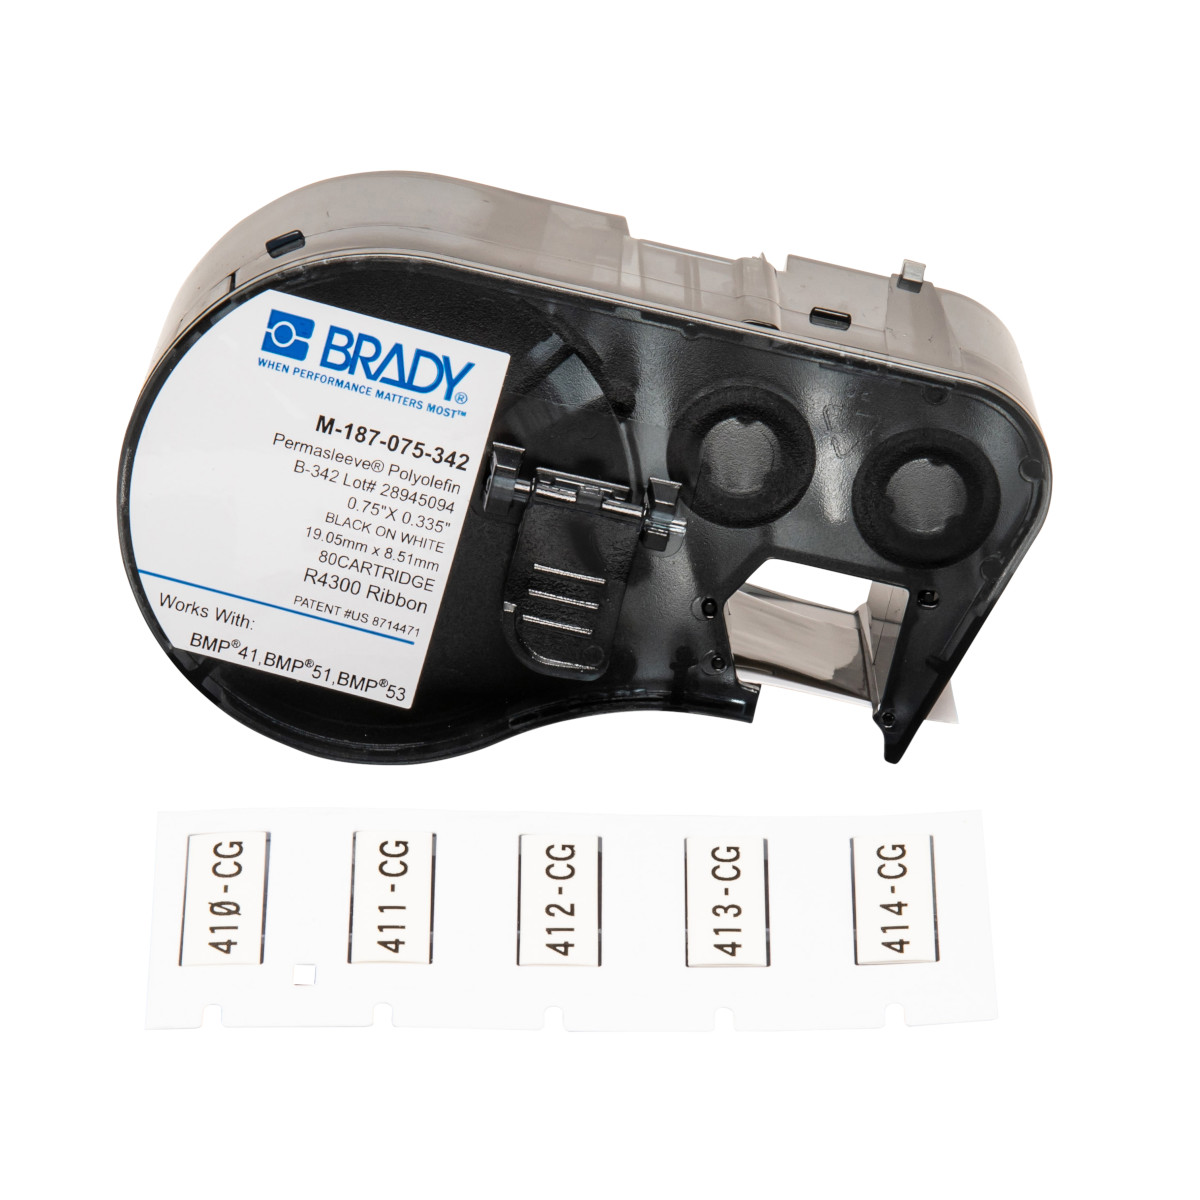 "BRADY M-187-075-342 Mseries B342Wht 0.75""X0.335"" 80Ea 1""Cart"